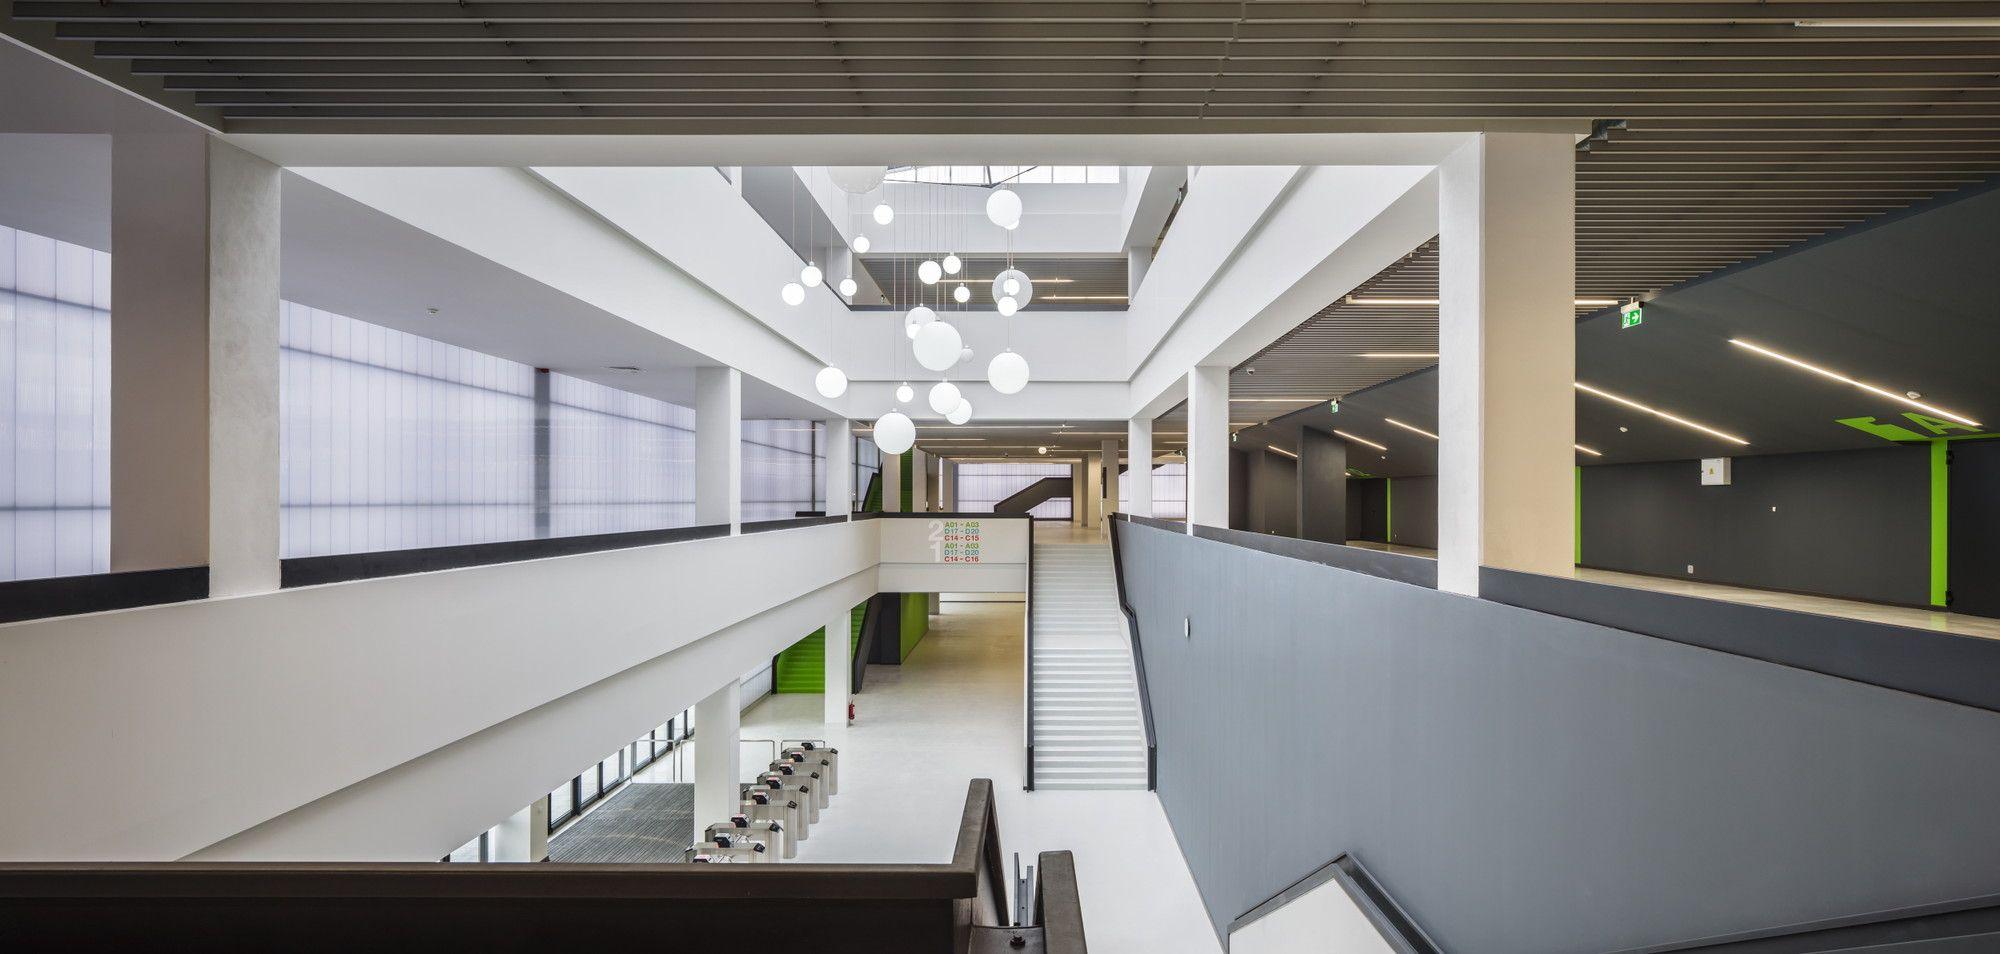 Gallery of Multifunctional Sports Hall / DICO si TIGANAS